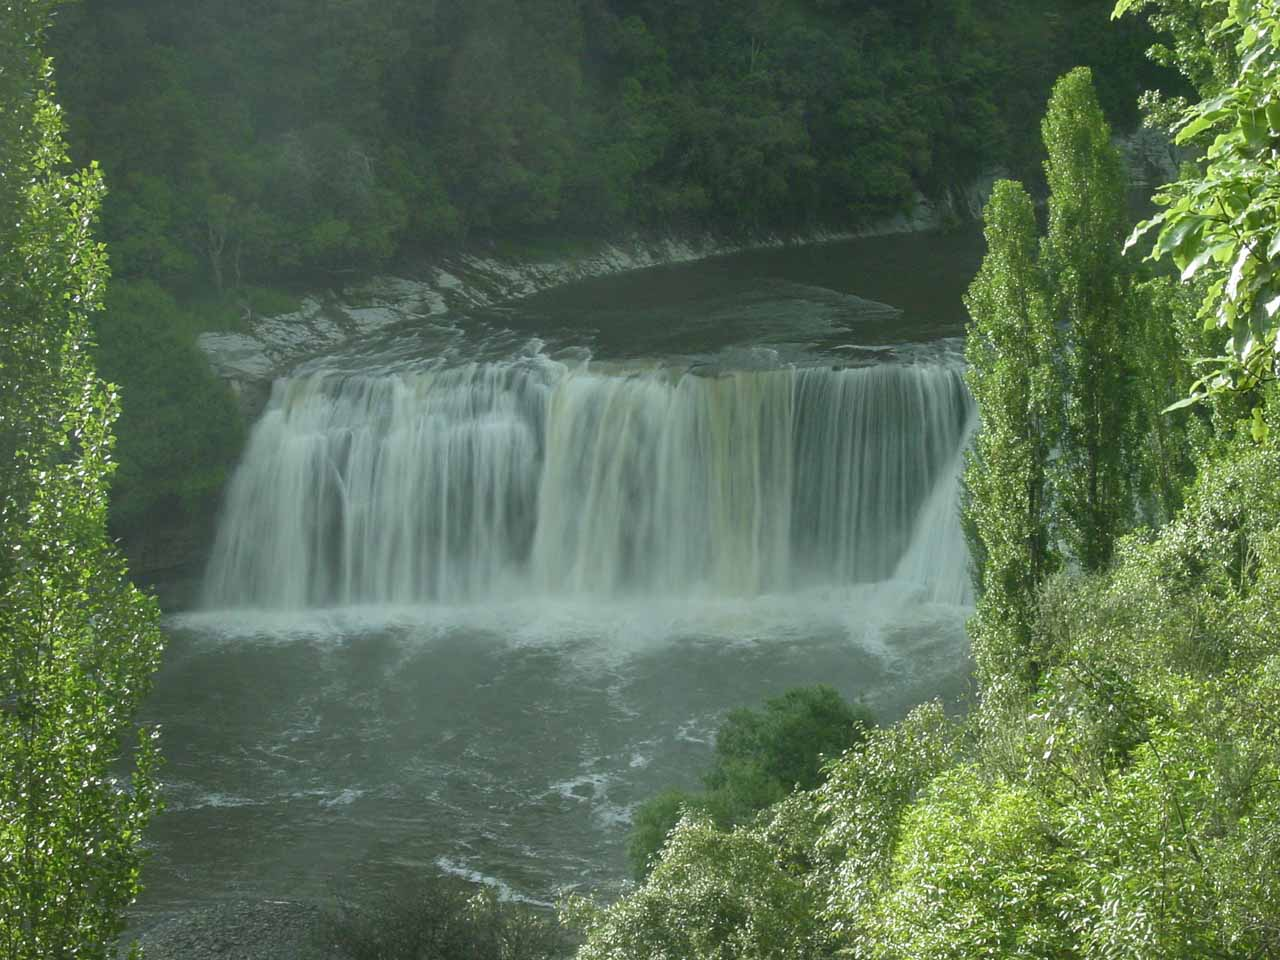 View of Raukawa Falls seen in 2004